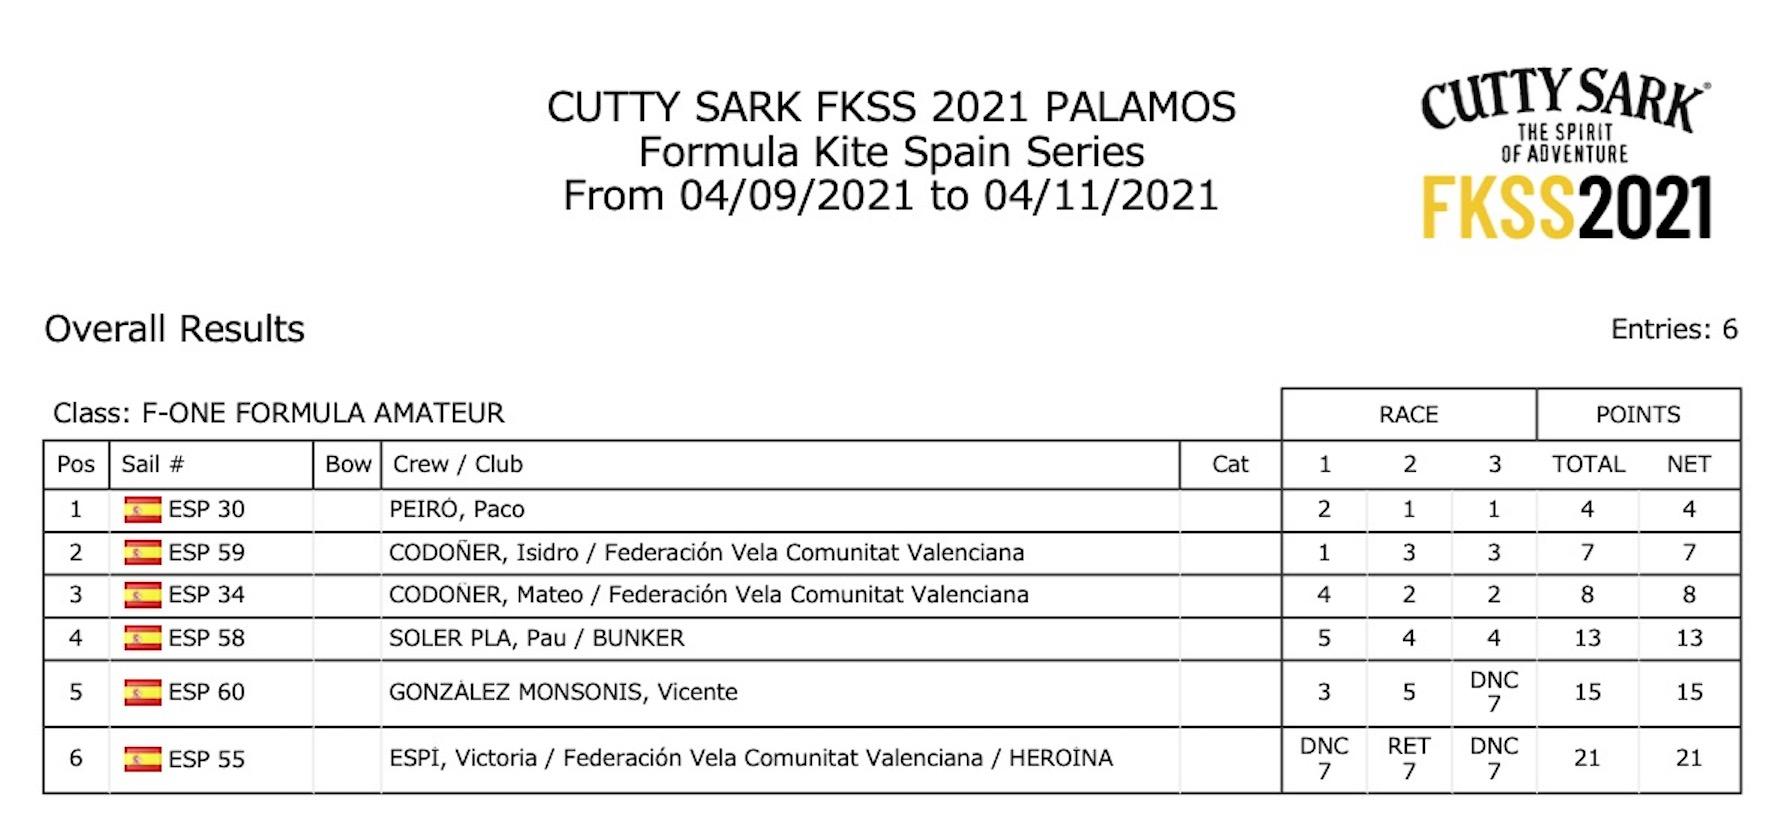 Clasifiación final F-One FKSS 2021 Palamós